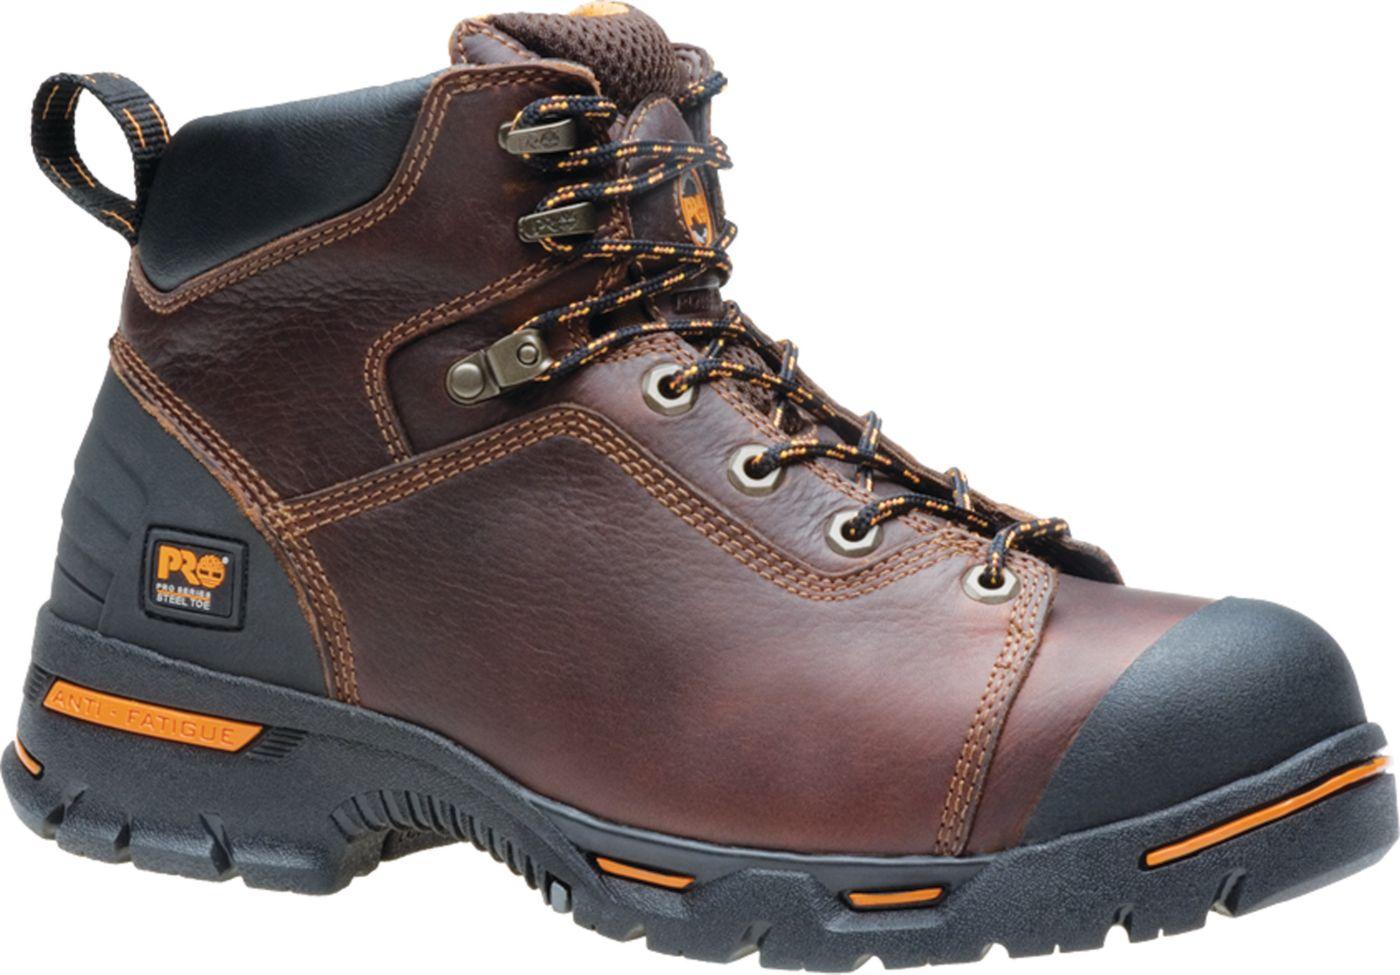 Timberland PRO Men's Endurance PR 6'' Work Boots